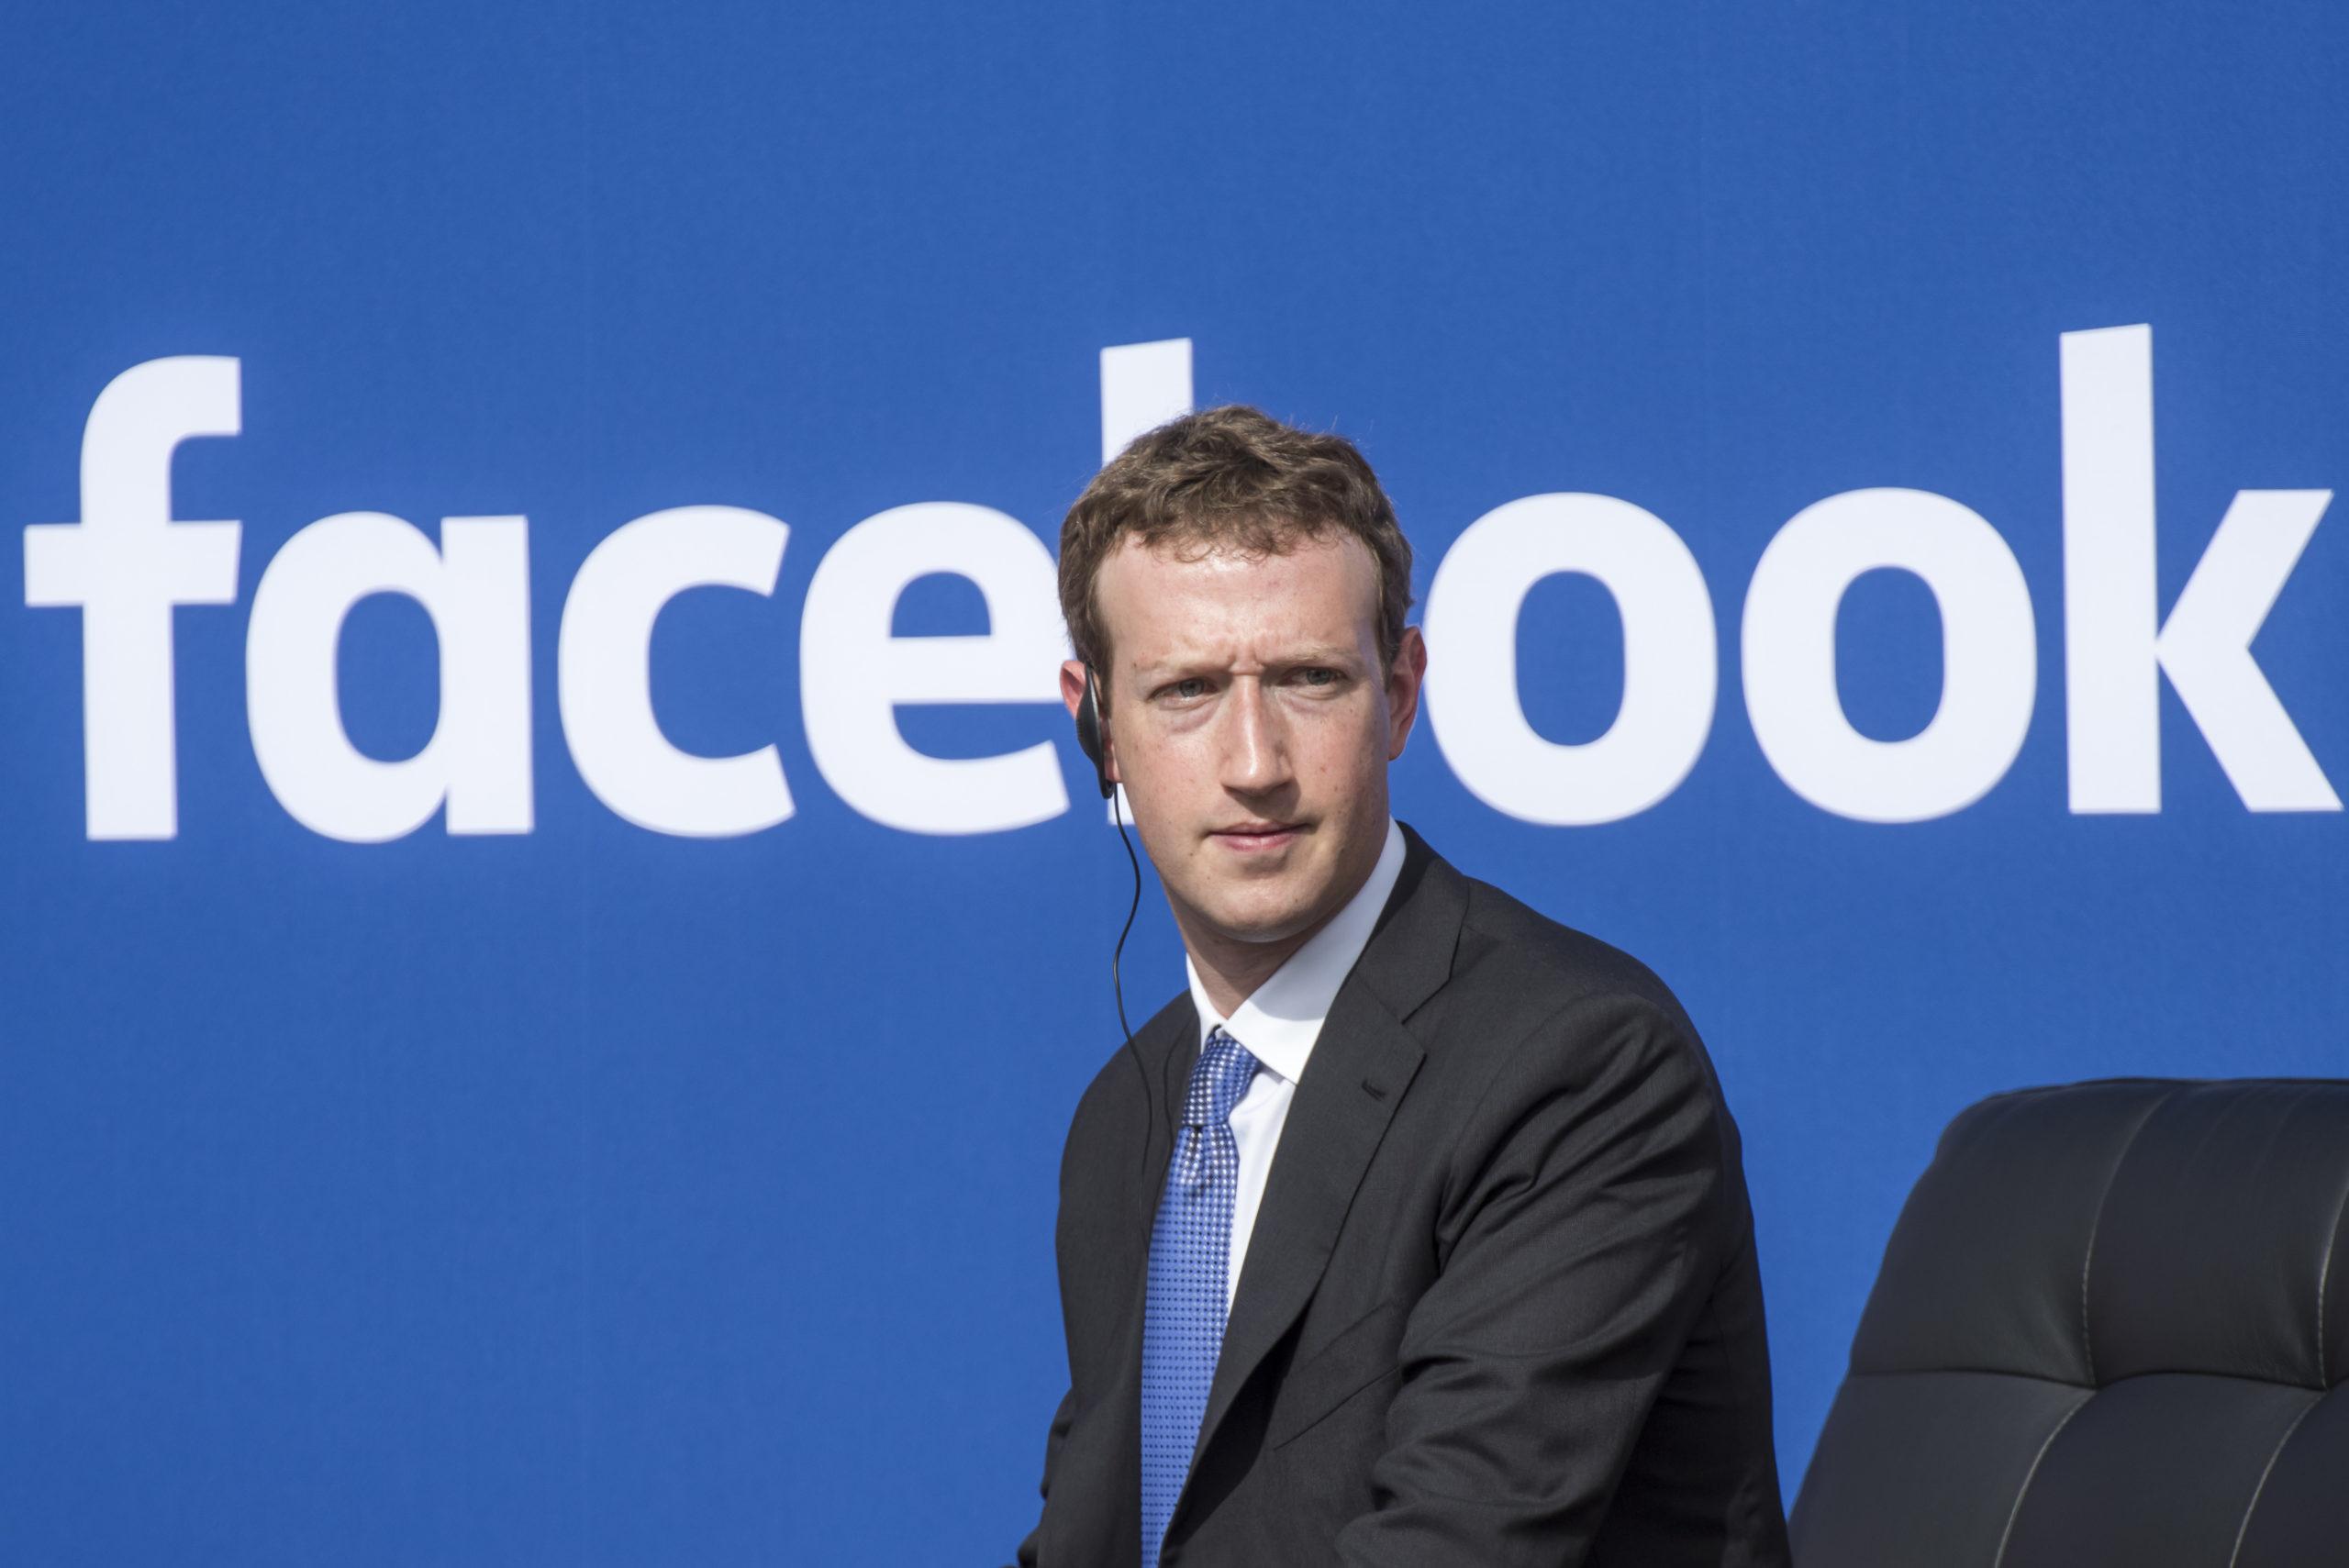 Mark Zuckerberg, chief executive officer of Facebook